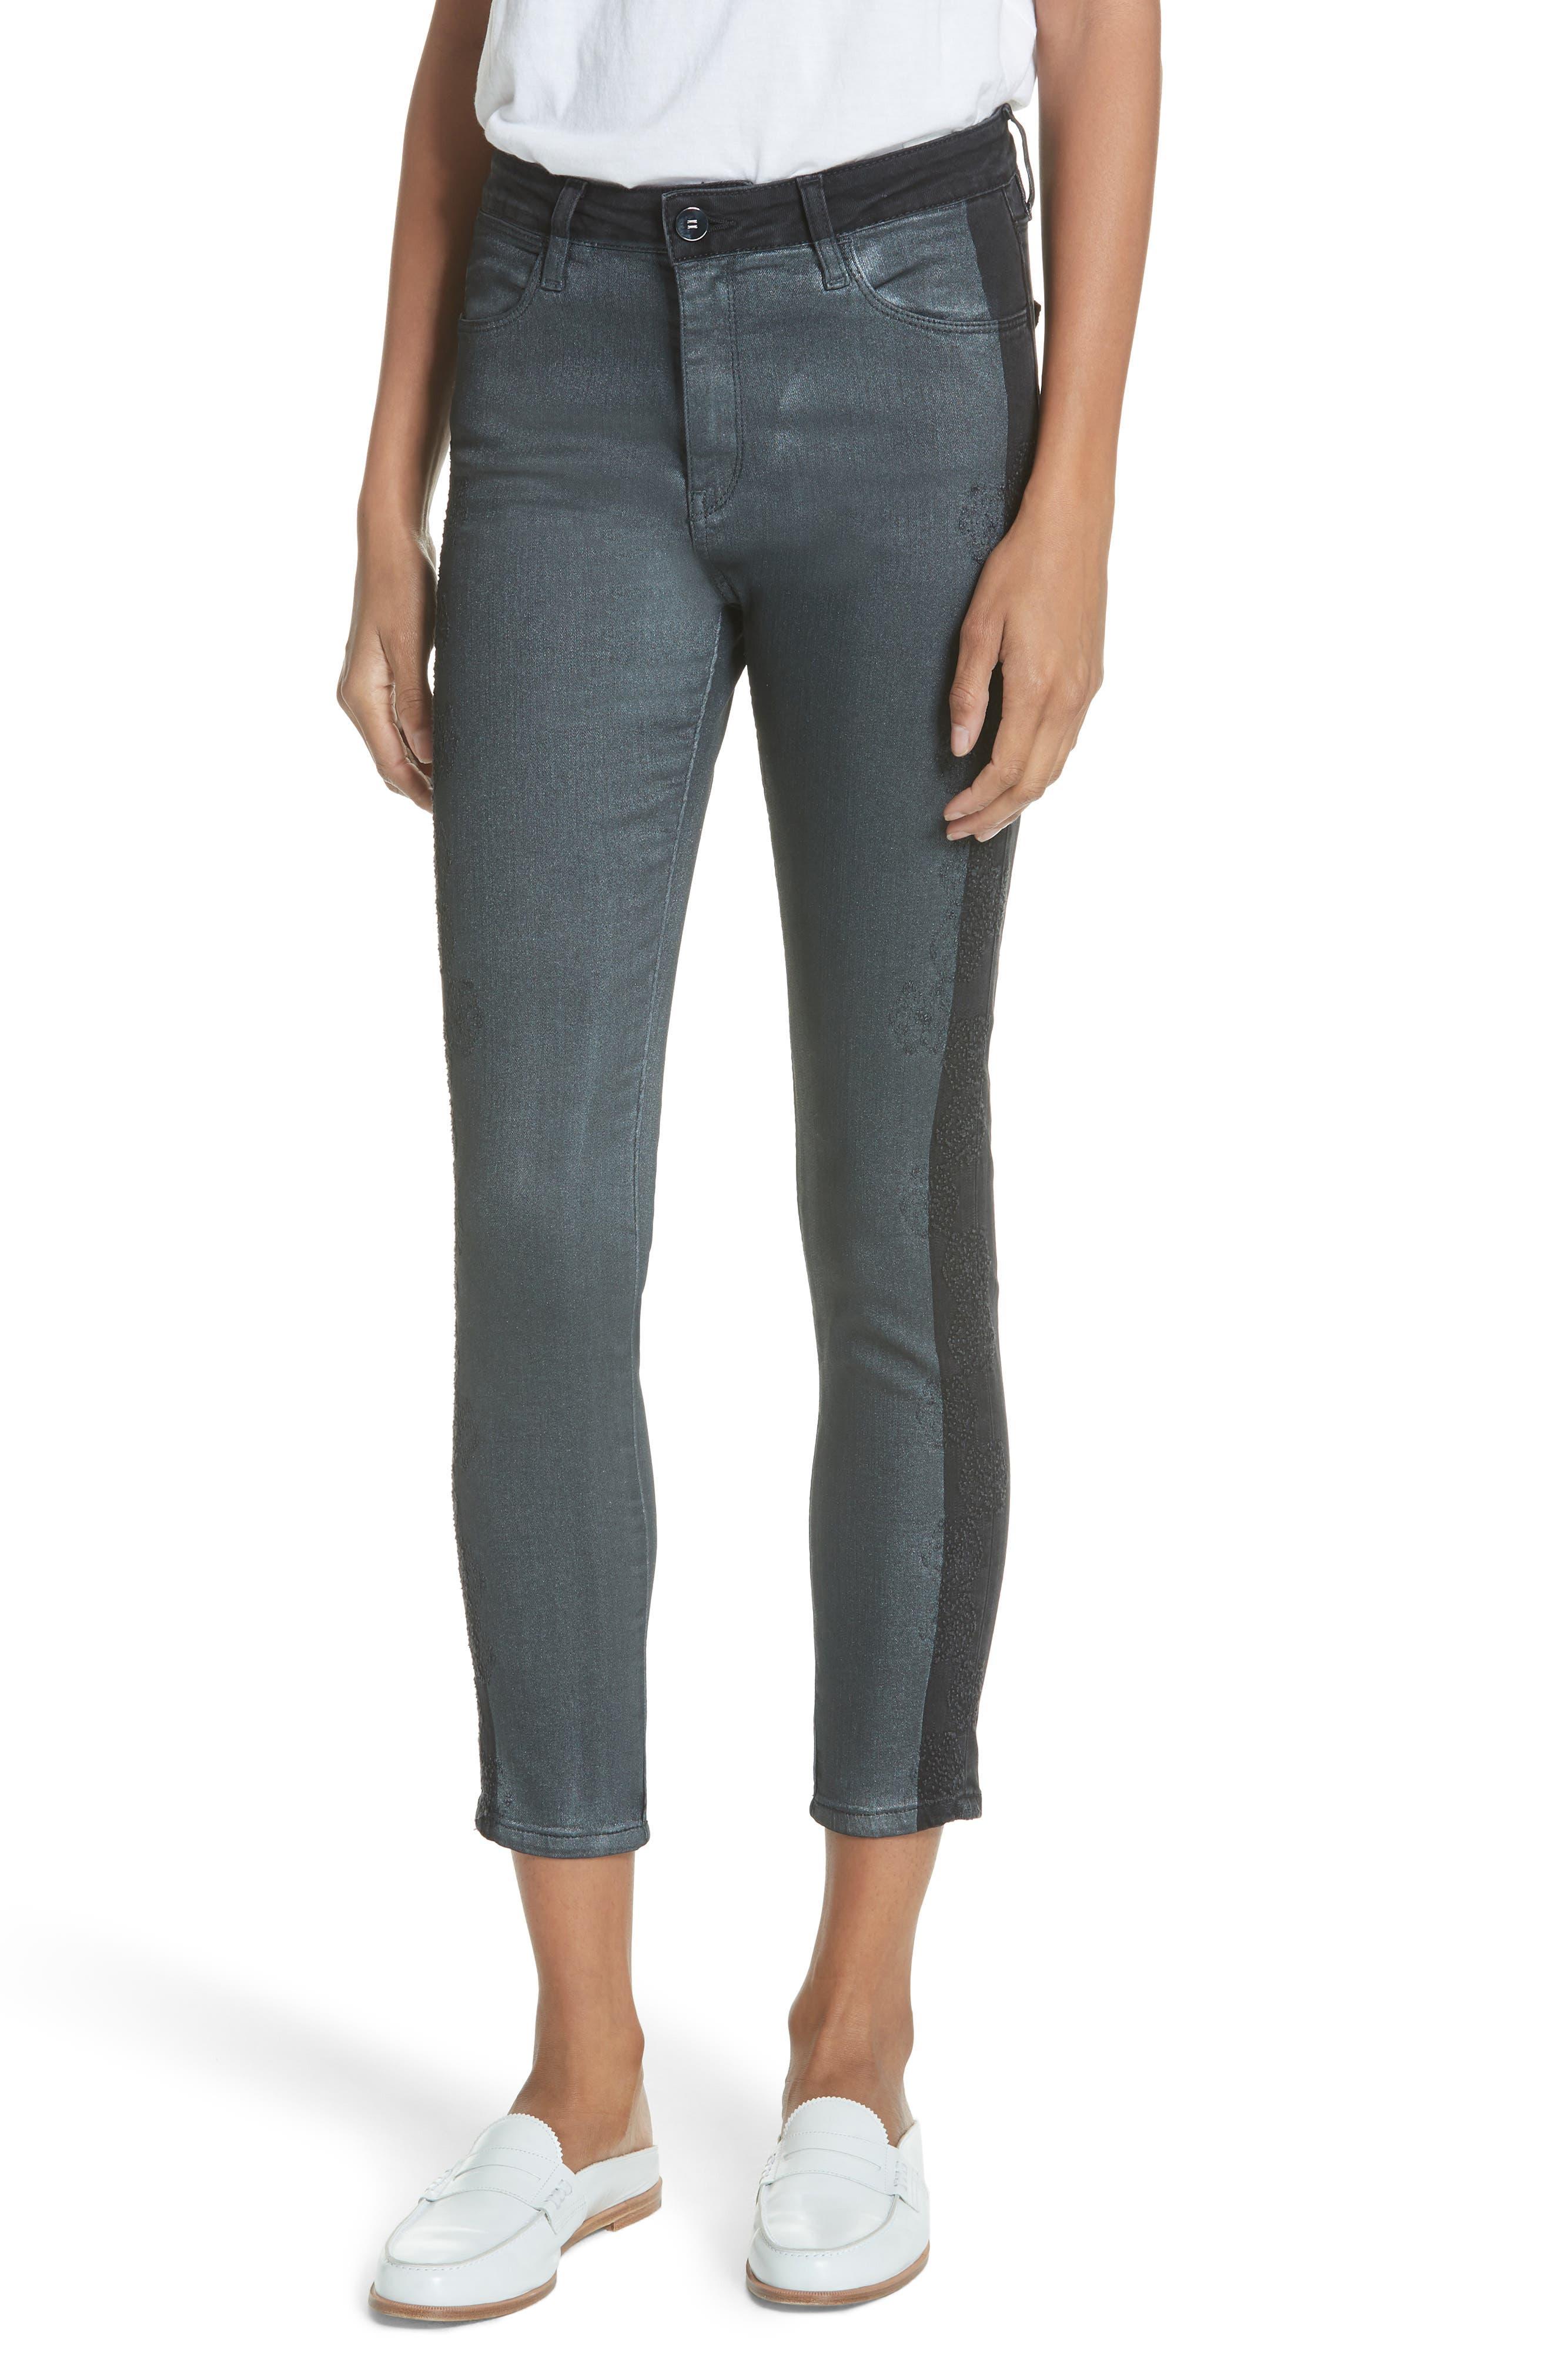 BROCKEN BOW Tuxedo Stripe Glitter Skinny Jeans in Black Glitter